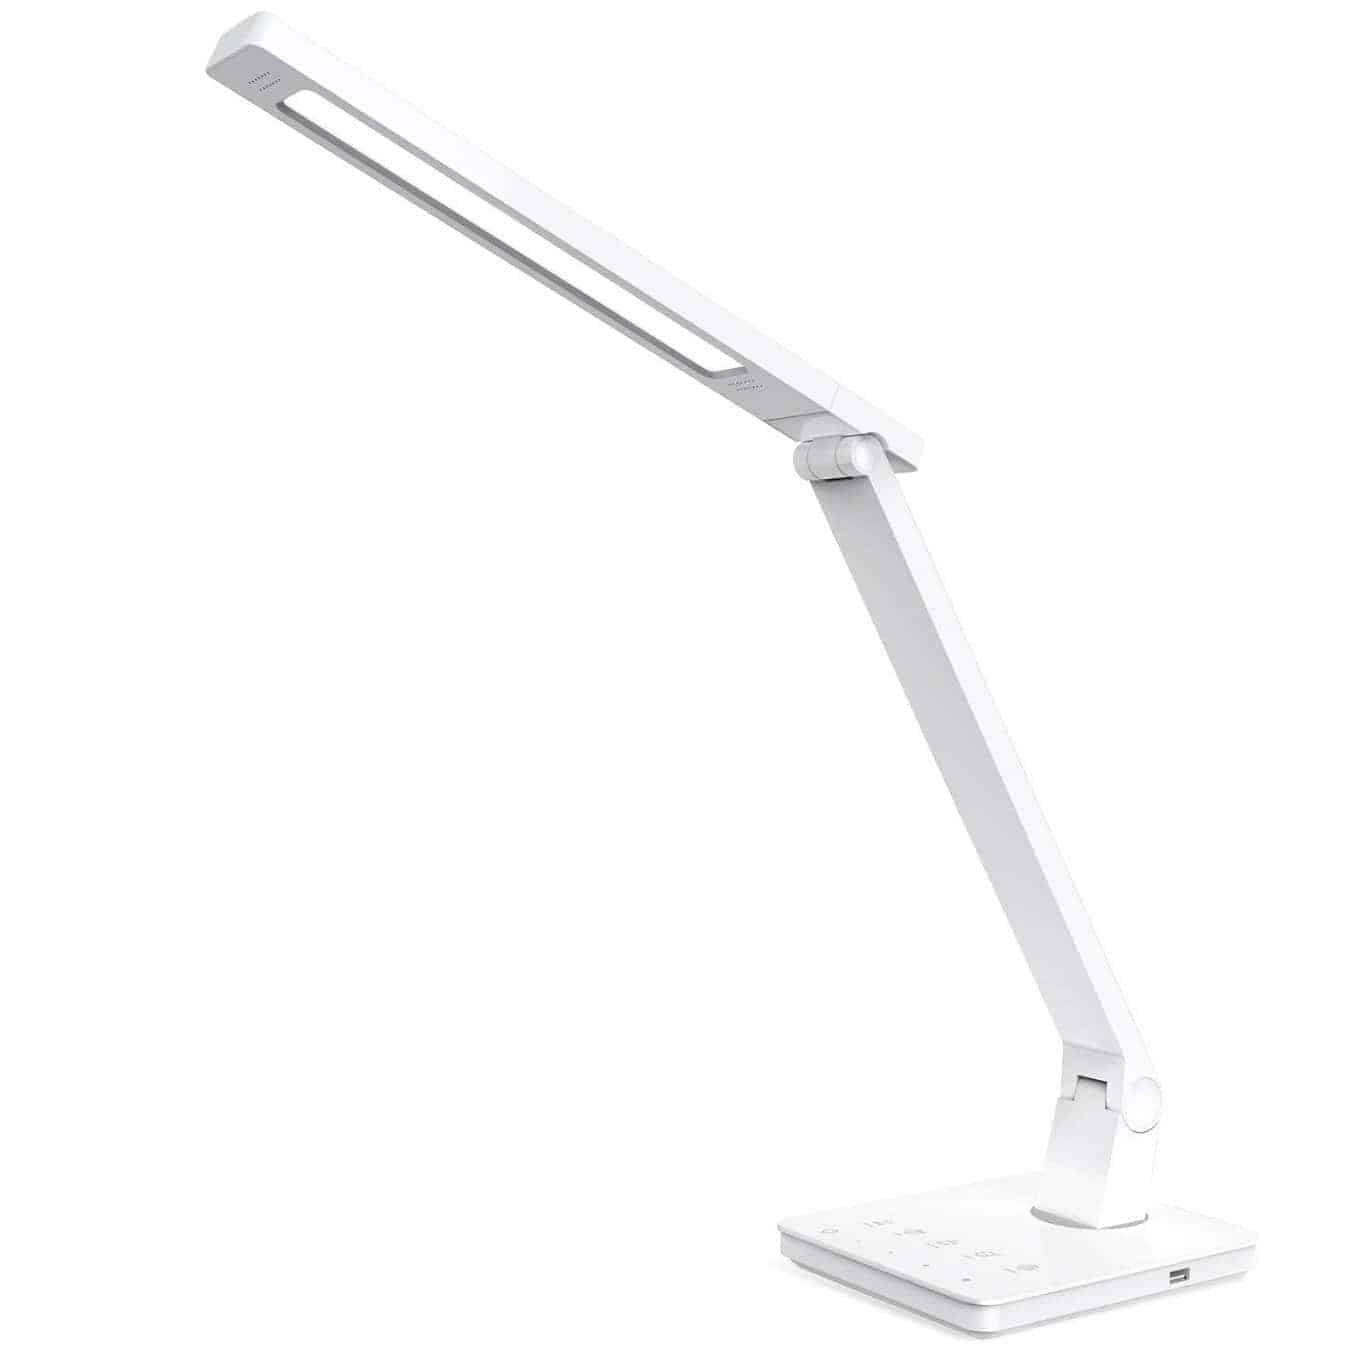 LED Dimmable Desk Lamp by BESTEK 01